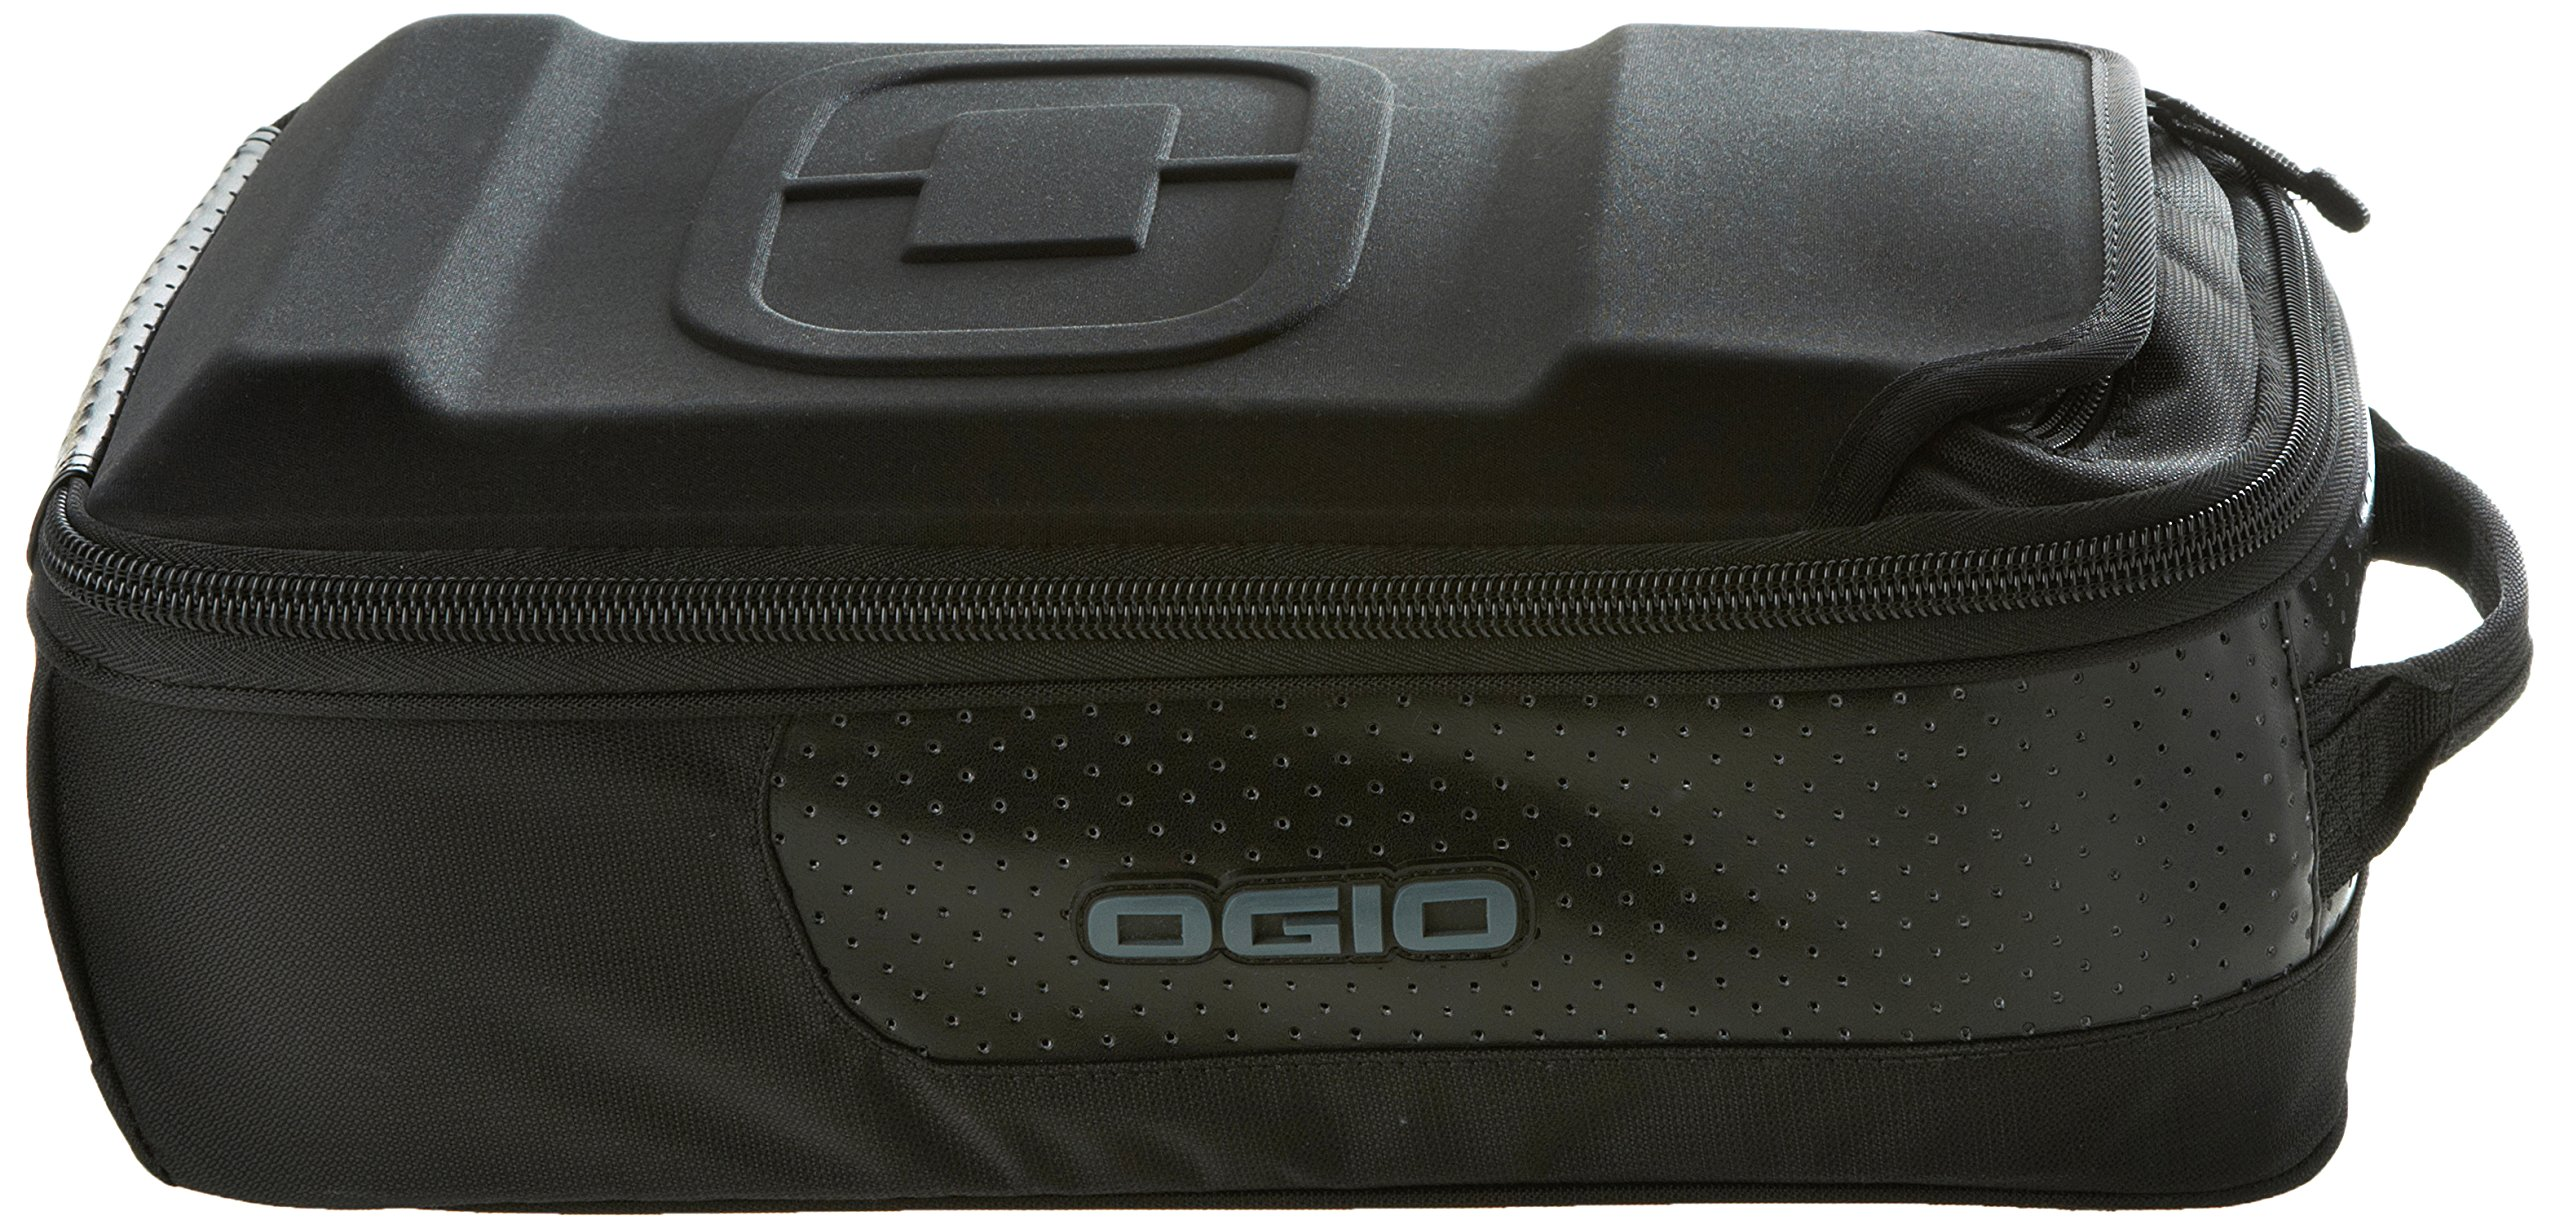 OGIO 109025.36 Stealth Black Google Box by OGIO